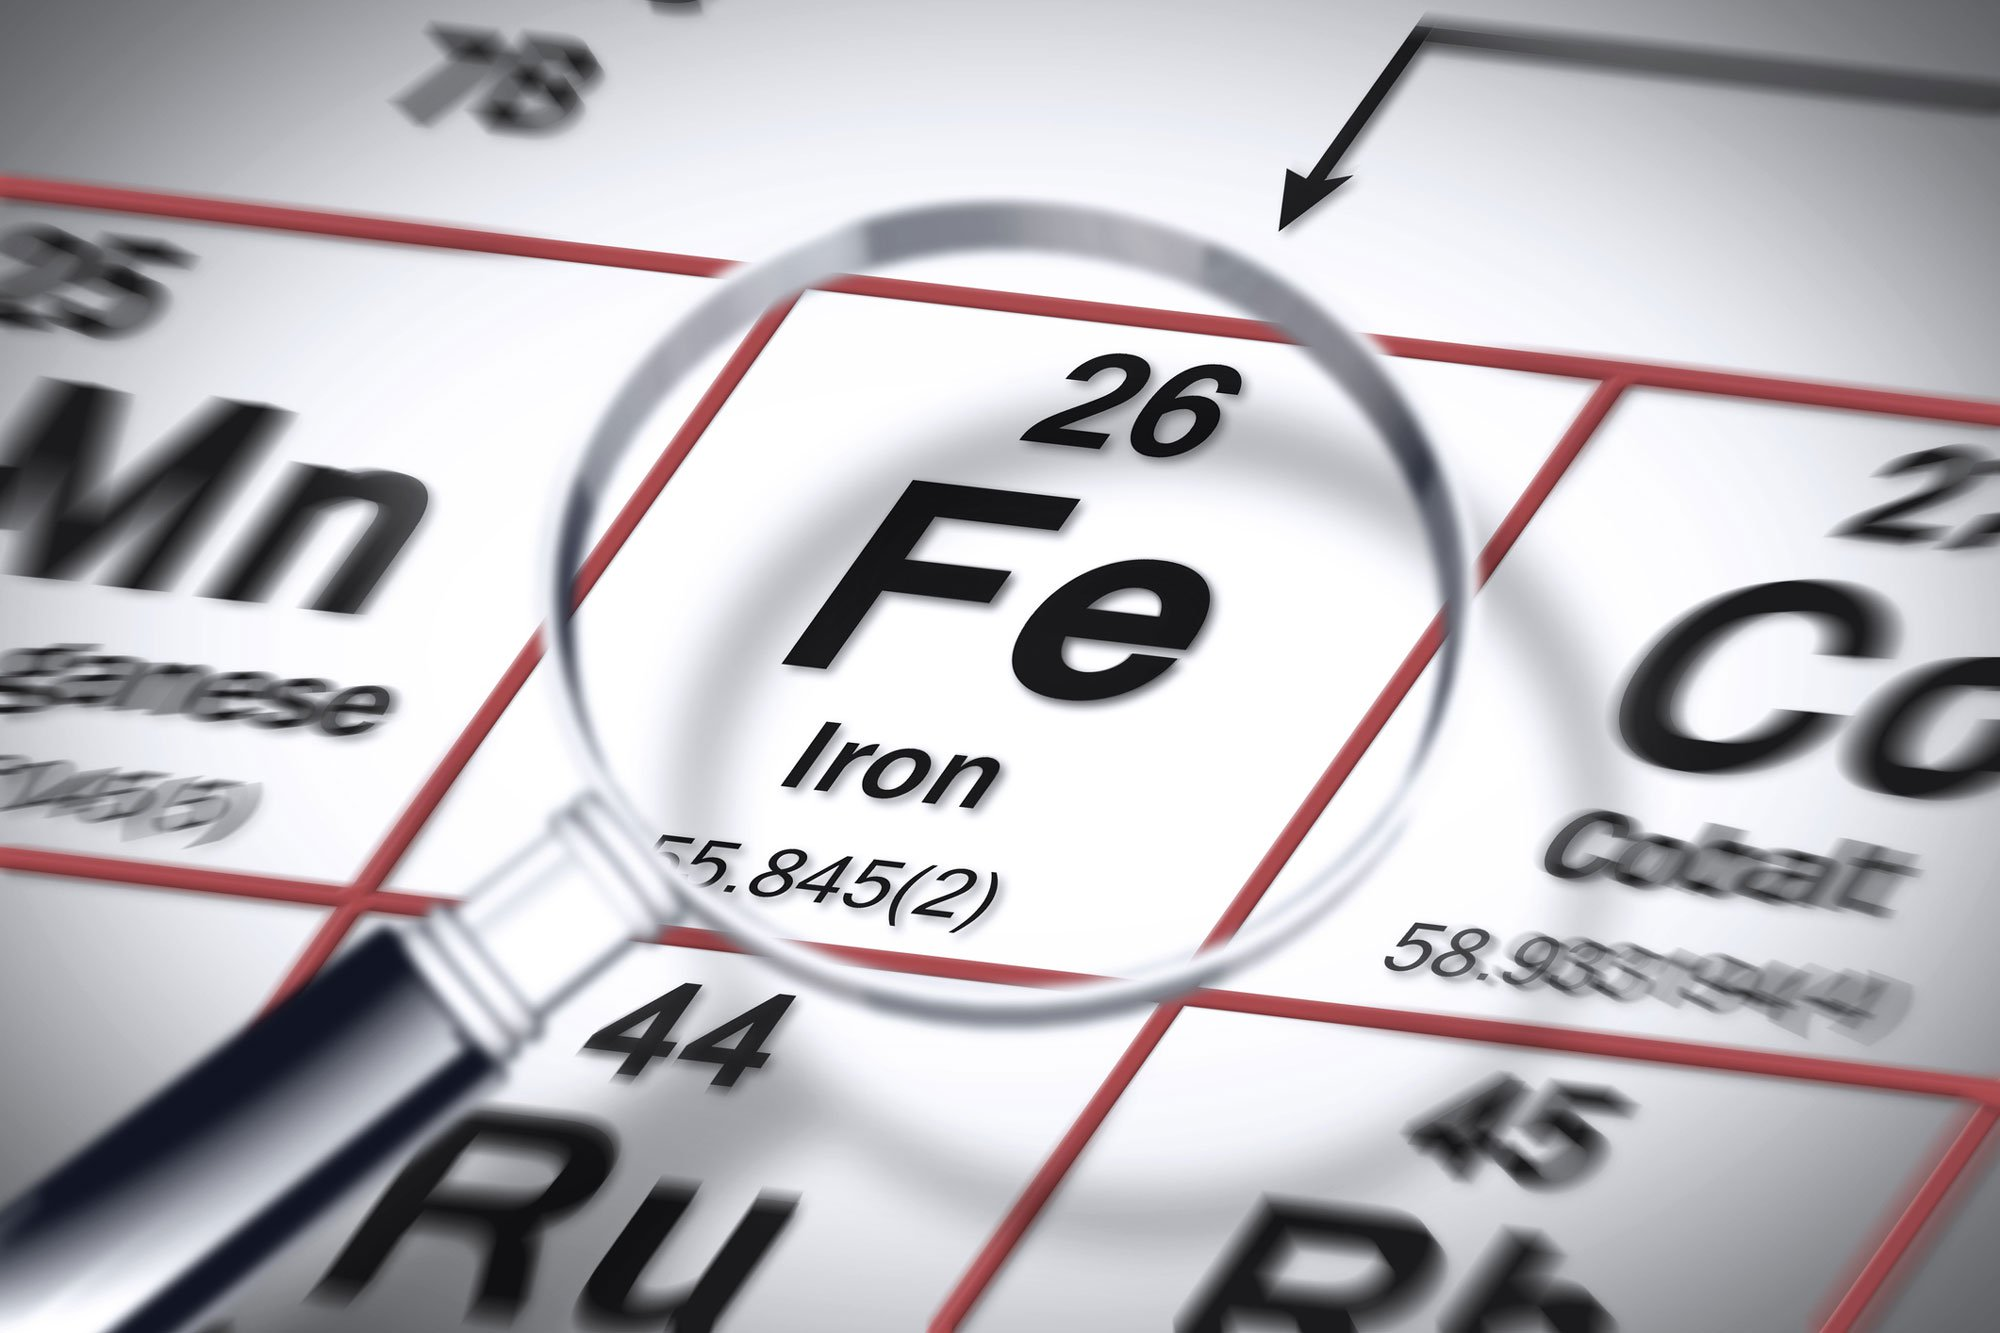 iron symbol on periodic table